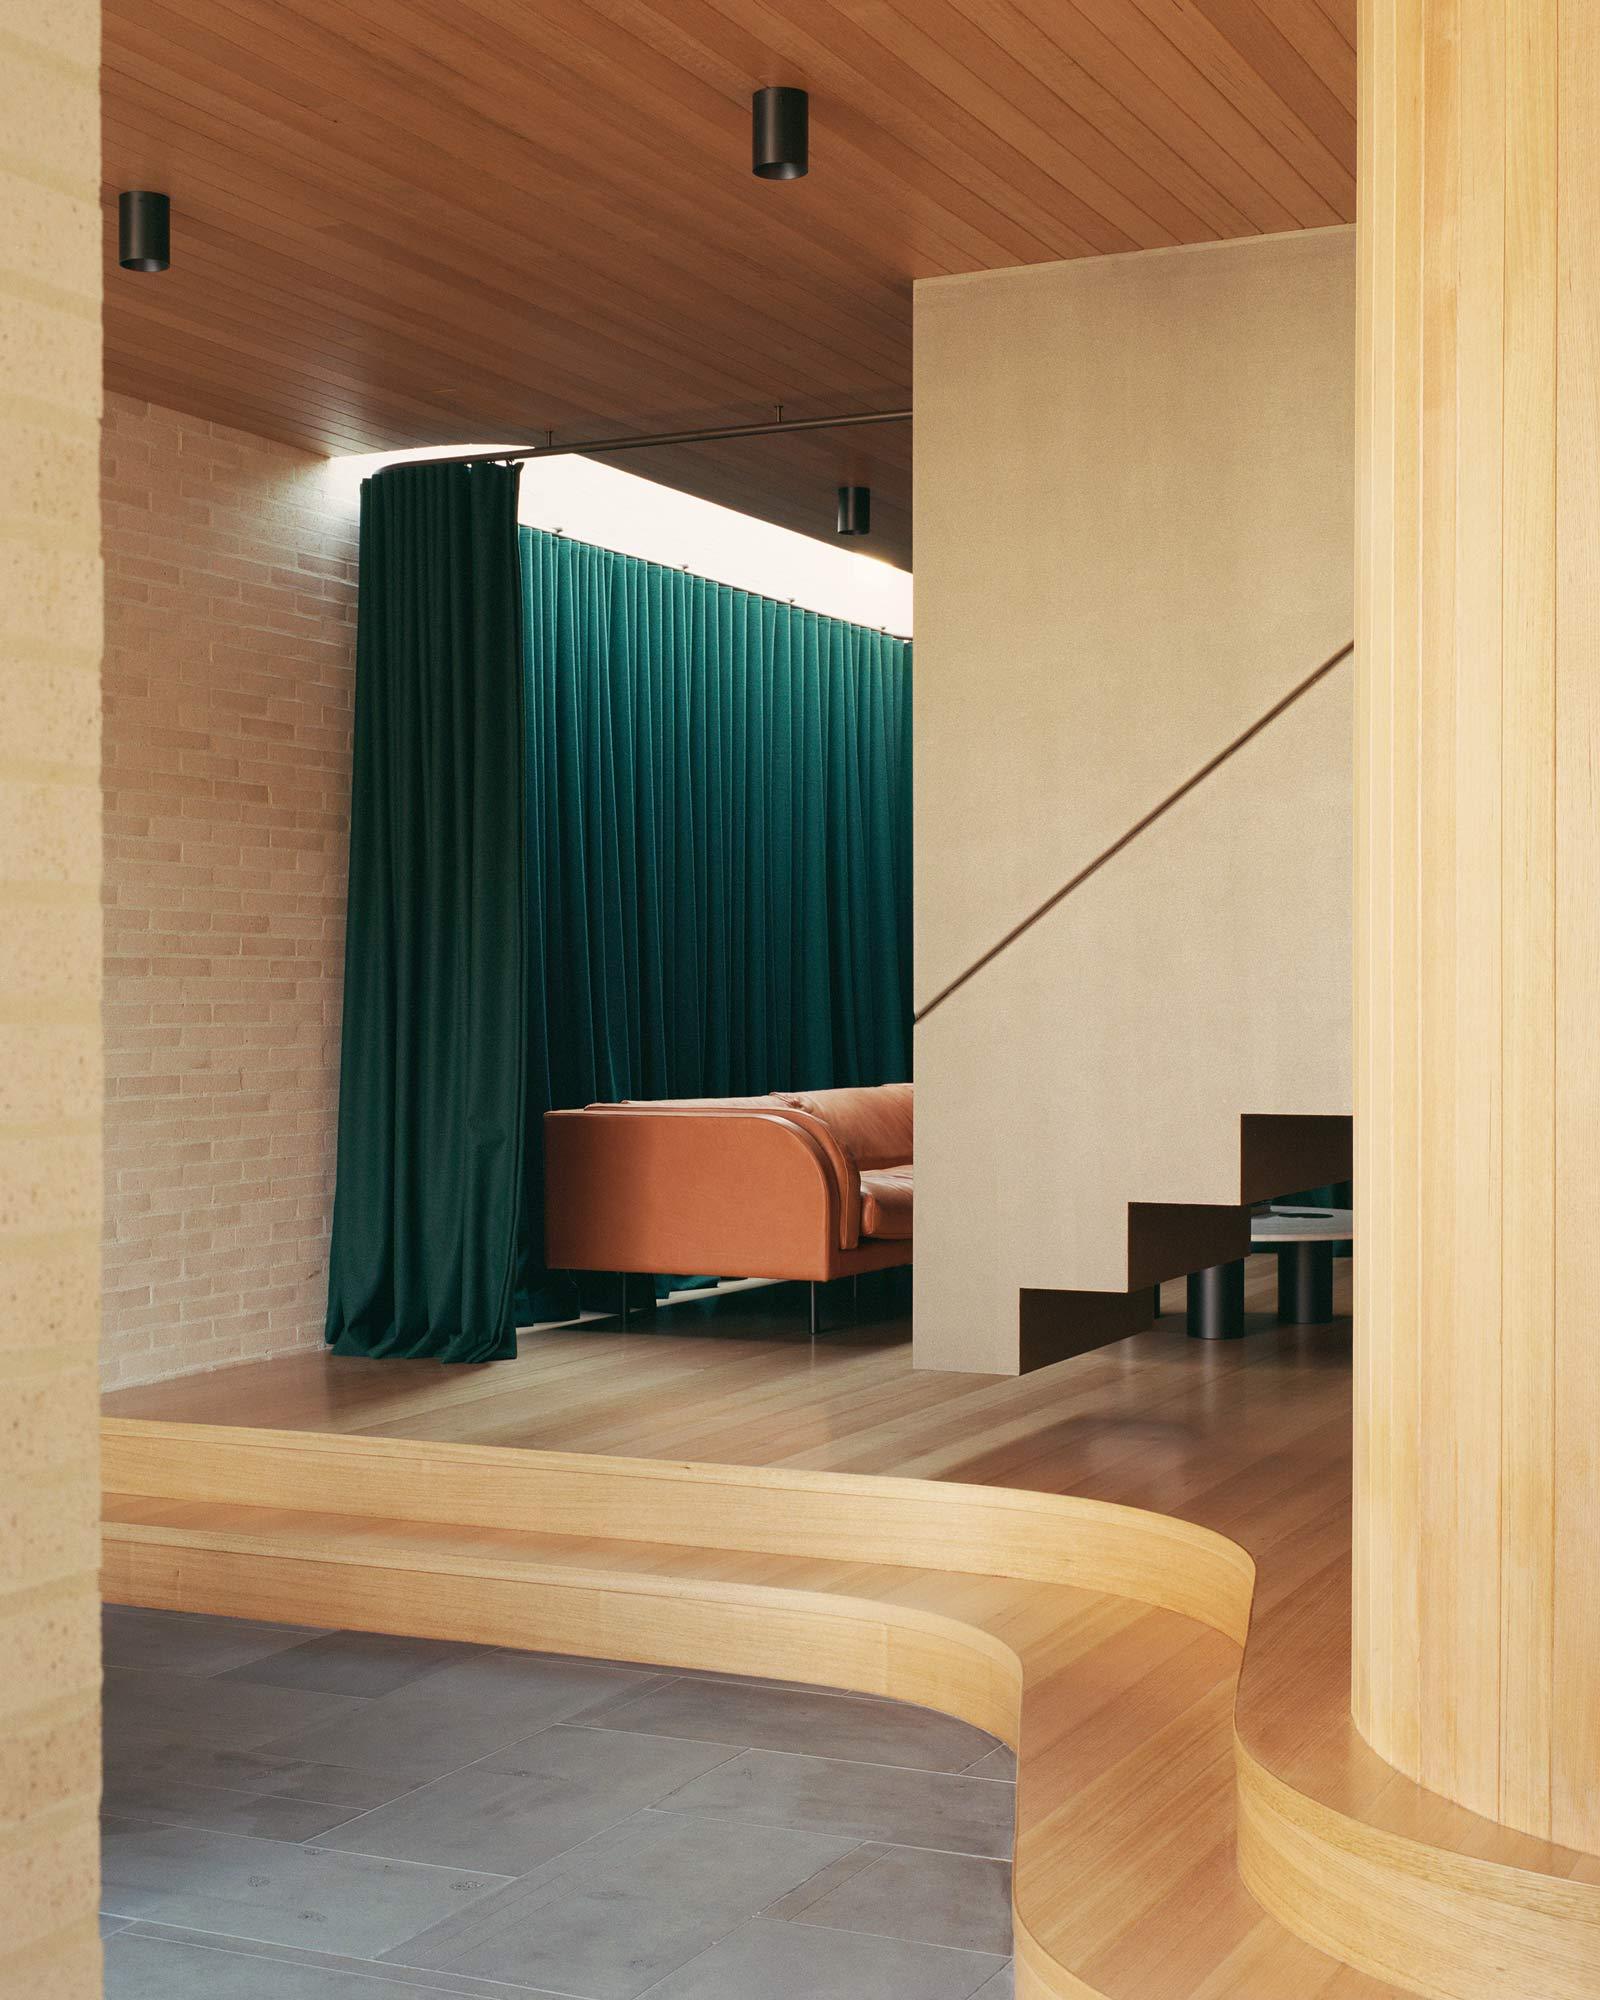 Anbau mit Pool in Melbourne von Studio Bright